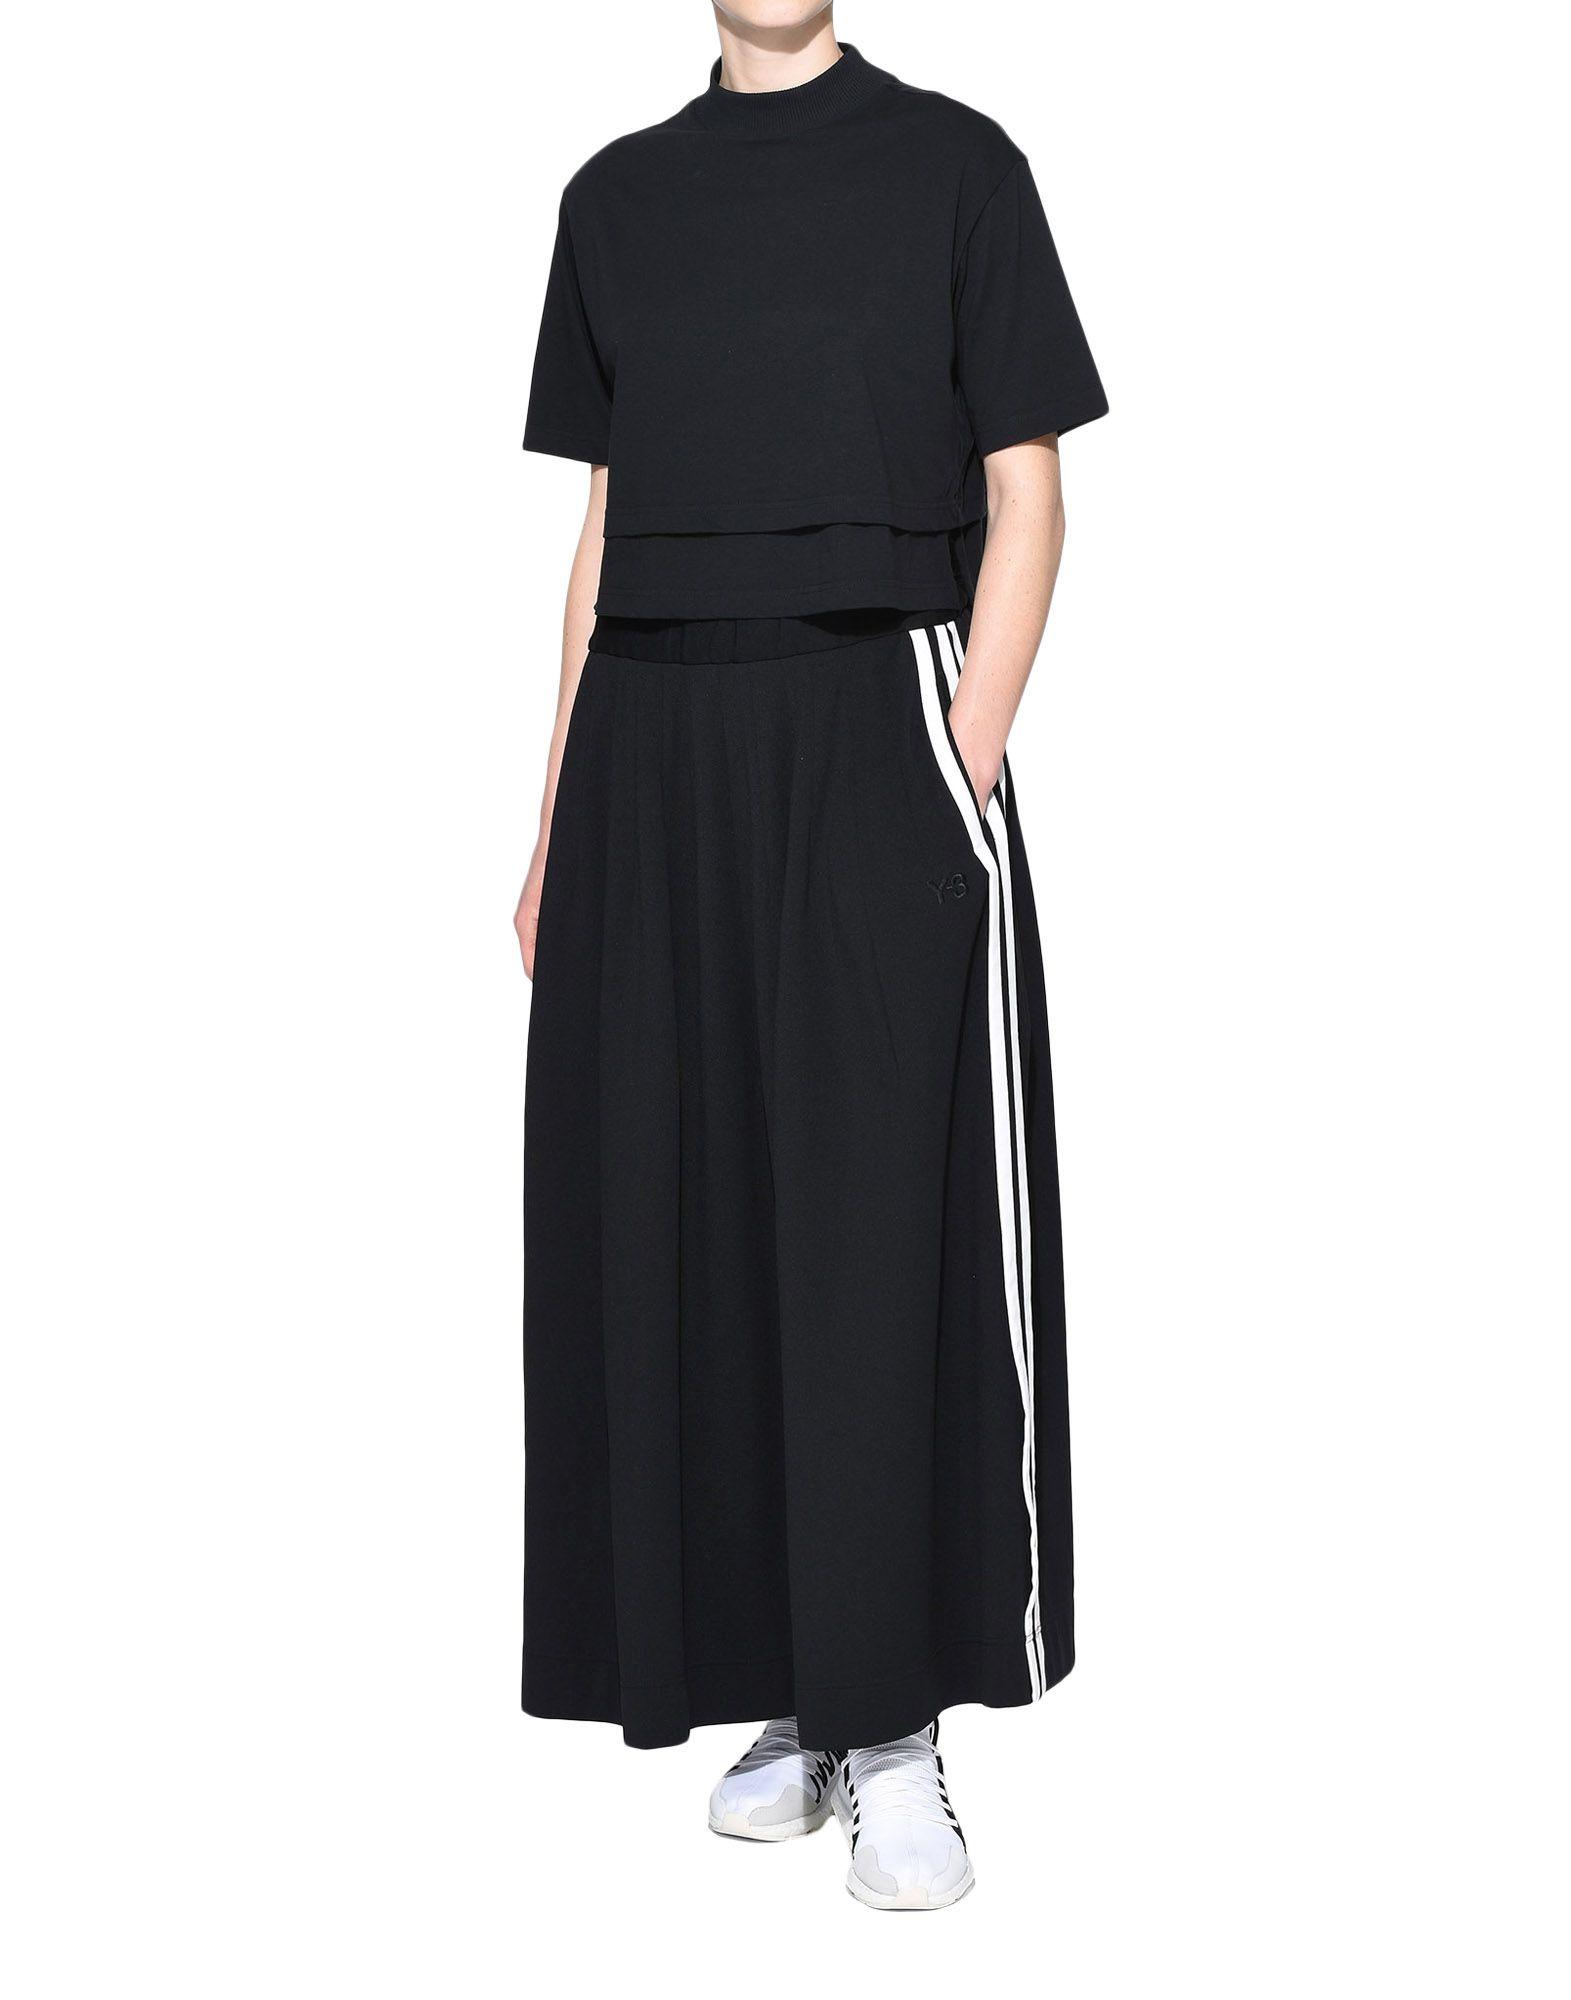 Y-3 Y-3 3-Stripes Selvedge Matte Track Skirt Юбка до колена Для Женщин a